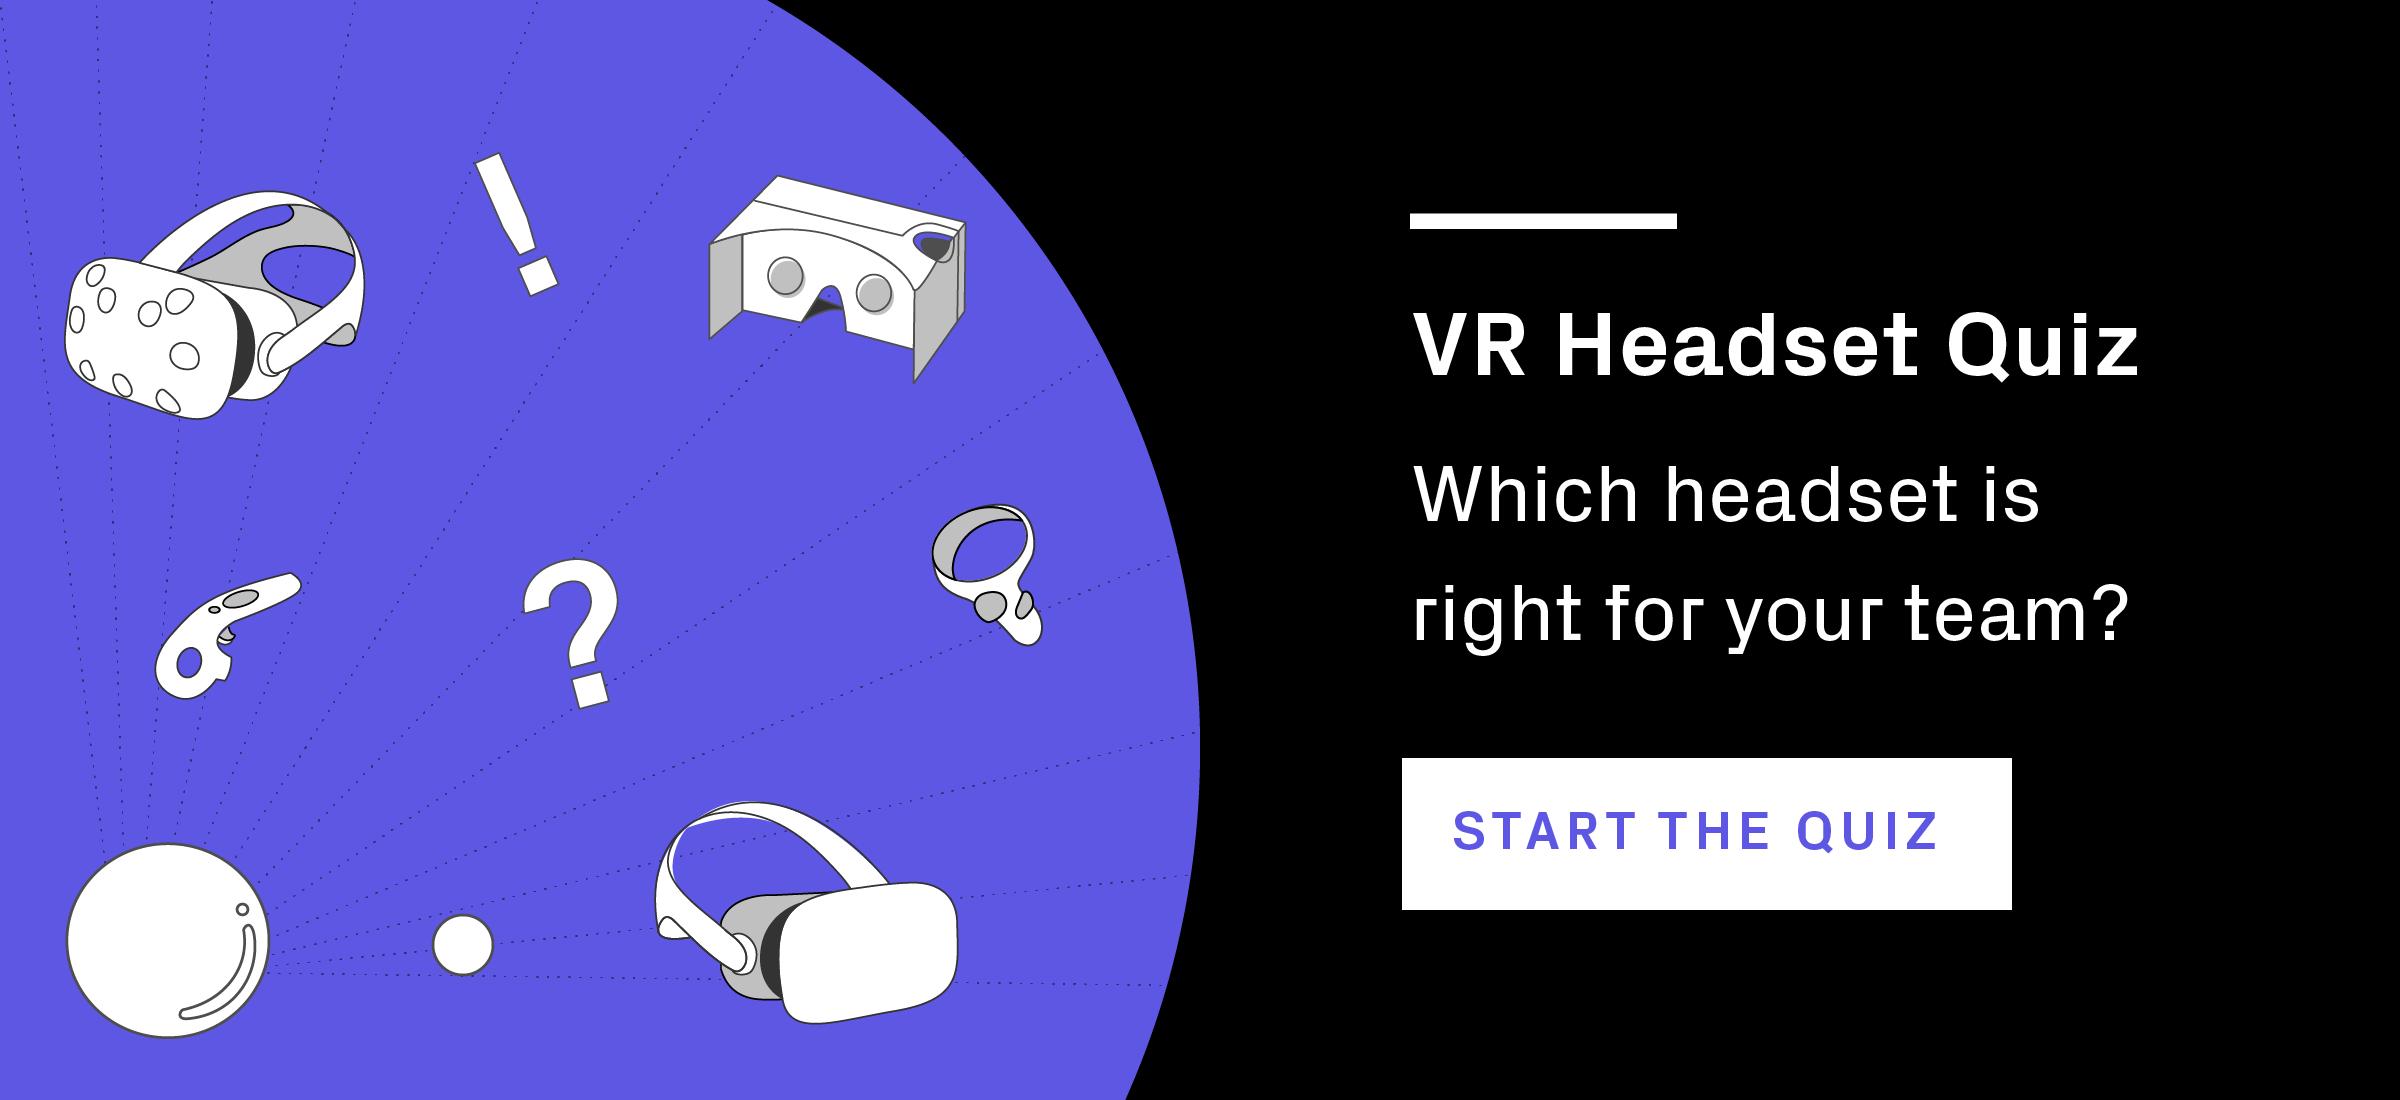 VR Headset Quiz